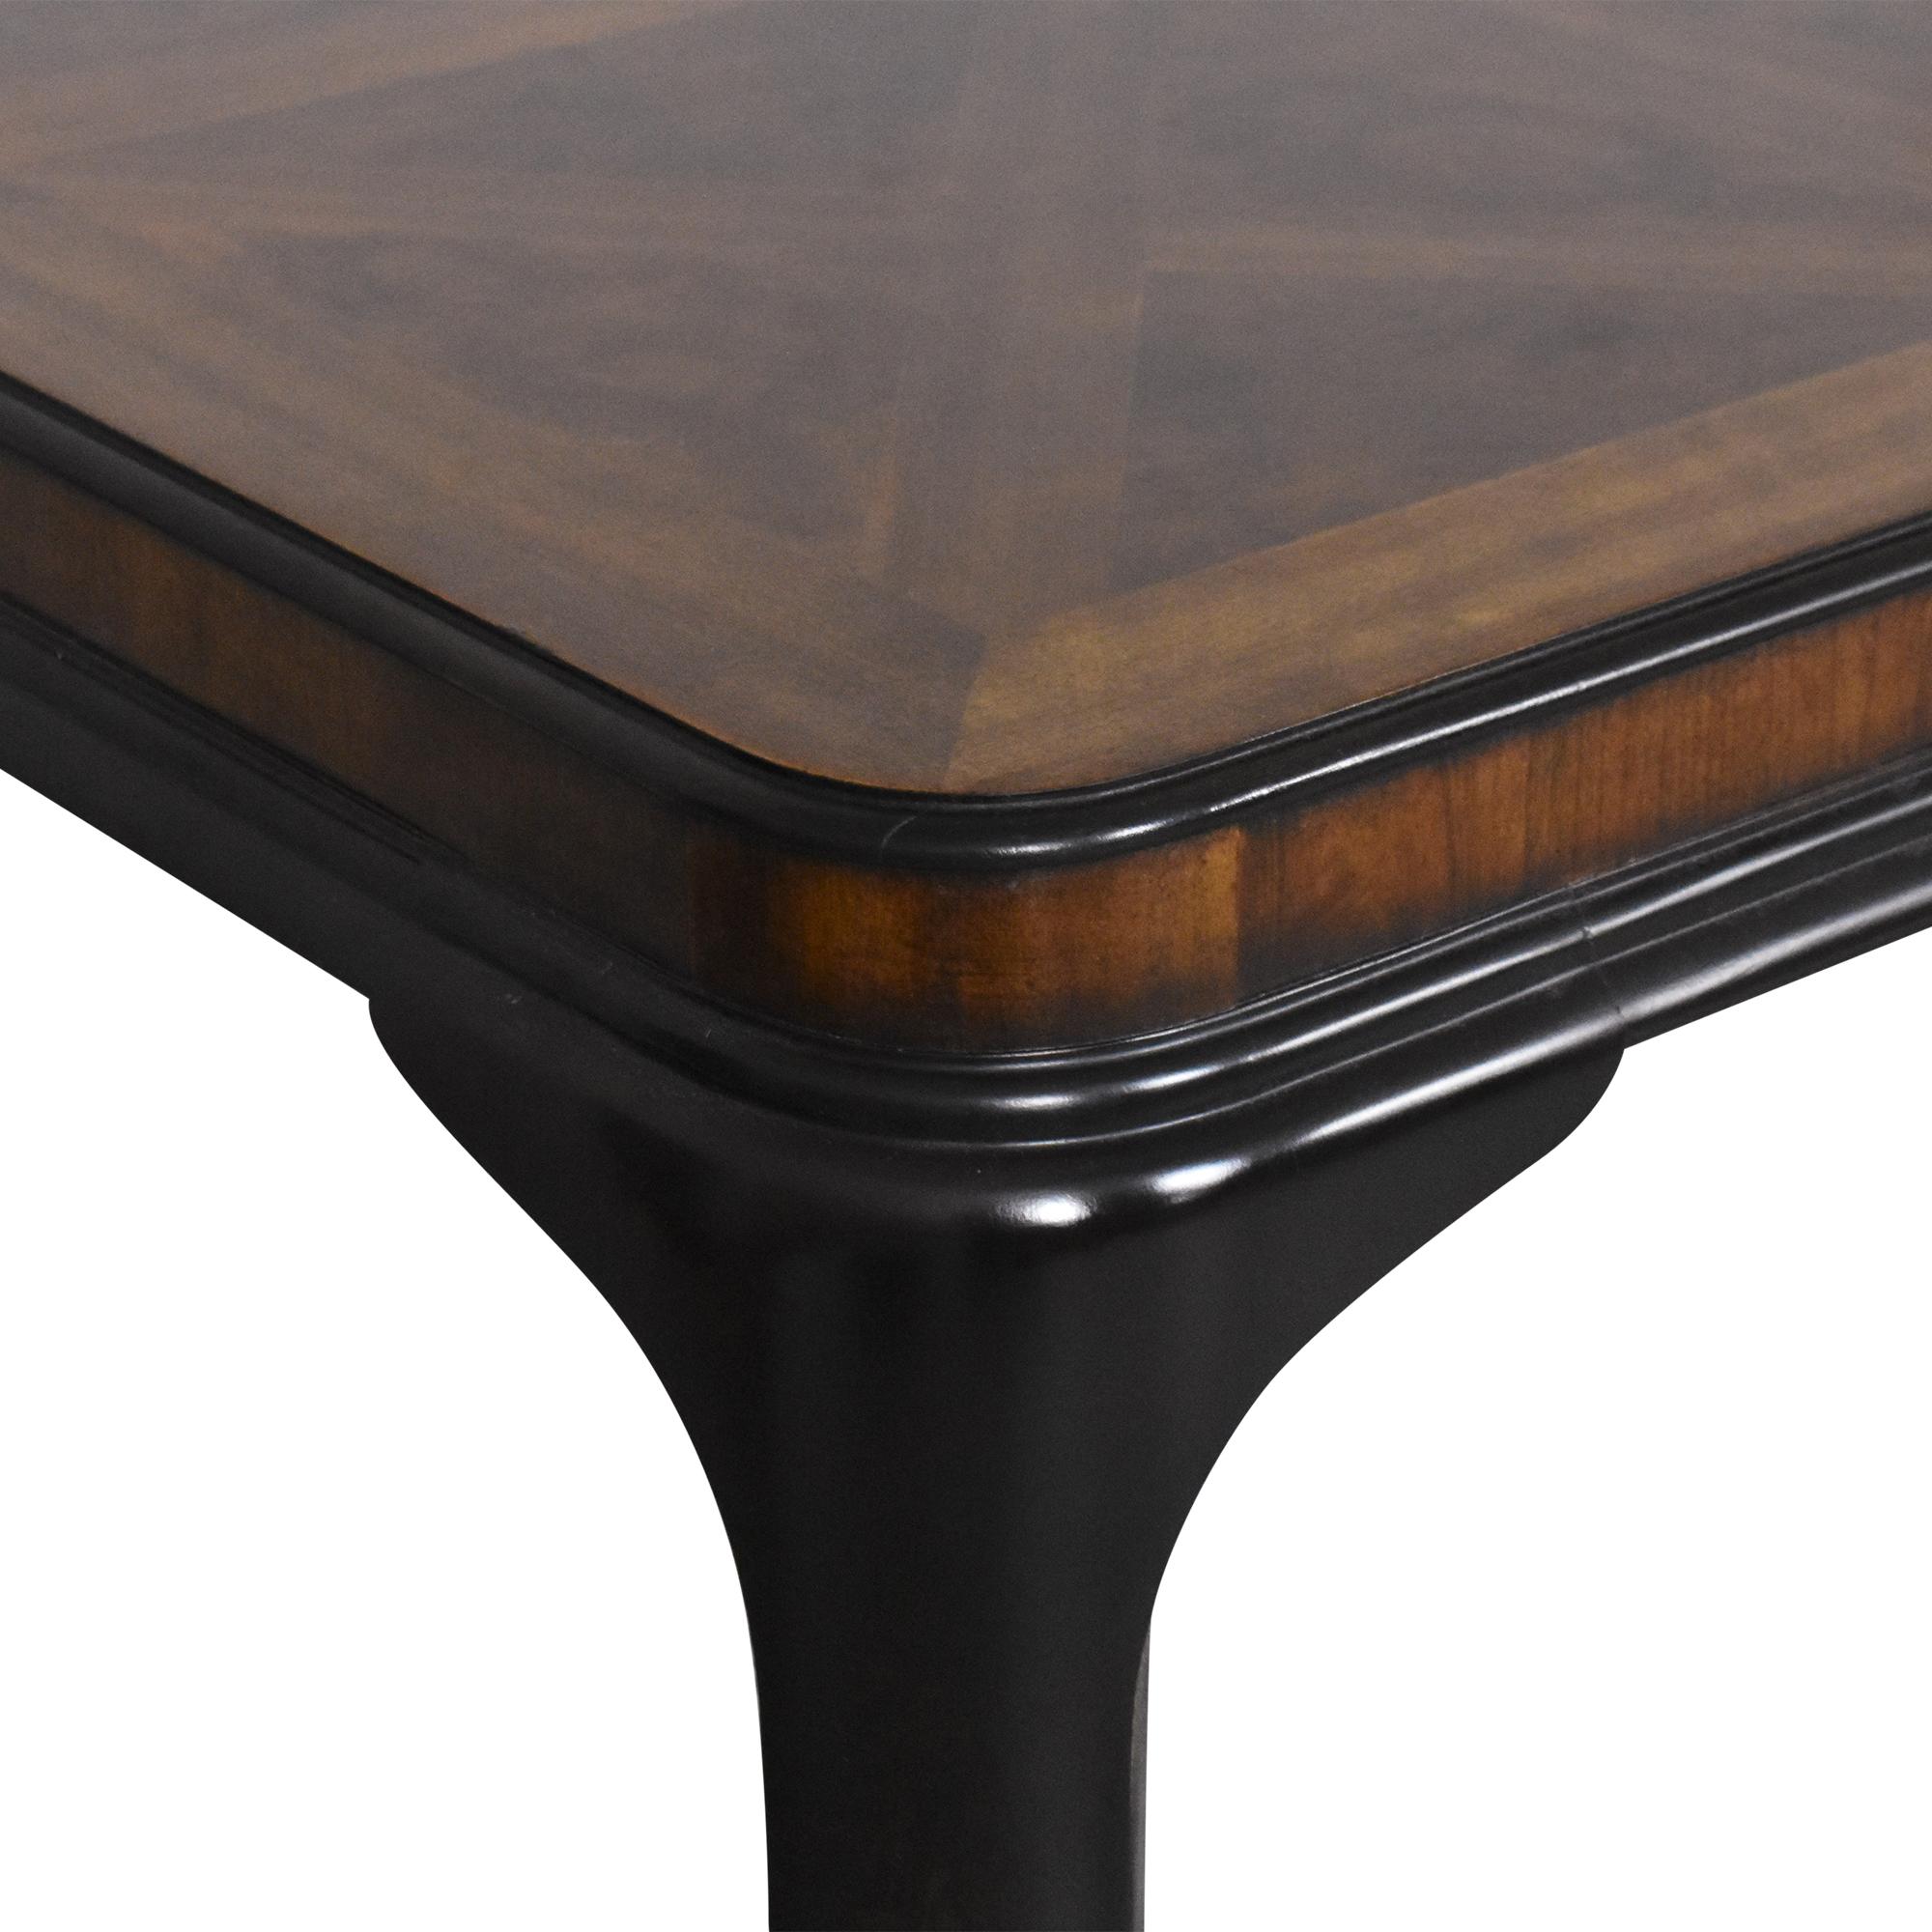 Drexel Heritage Drexel Heritage Connoisseur Dining Table ct